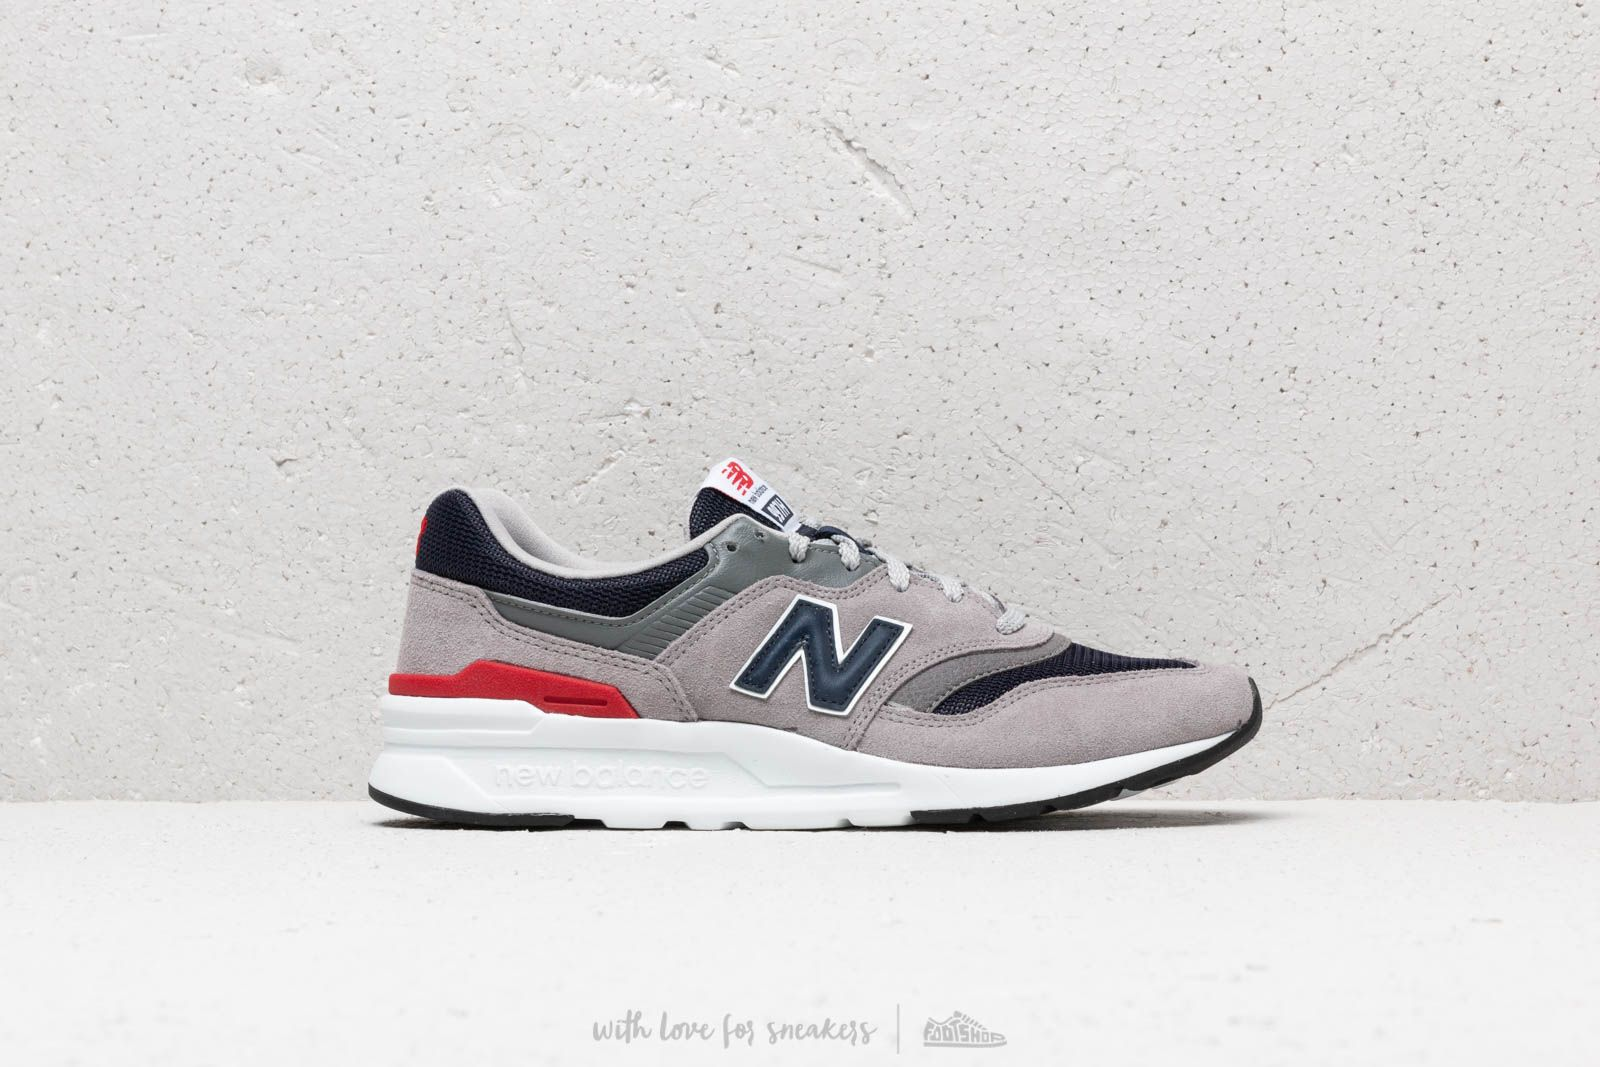 new balance 997 navy blue